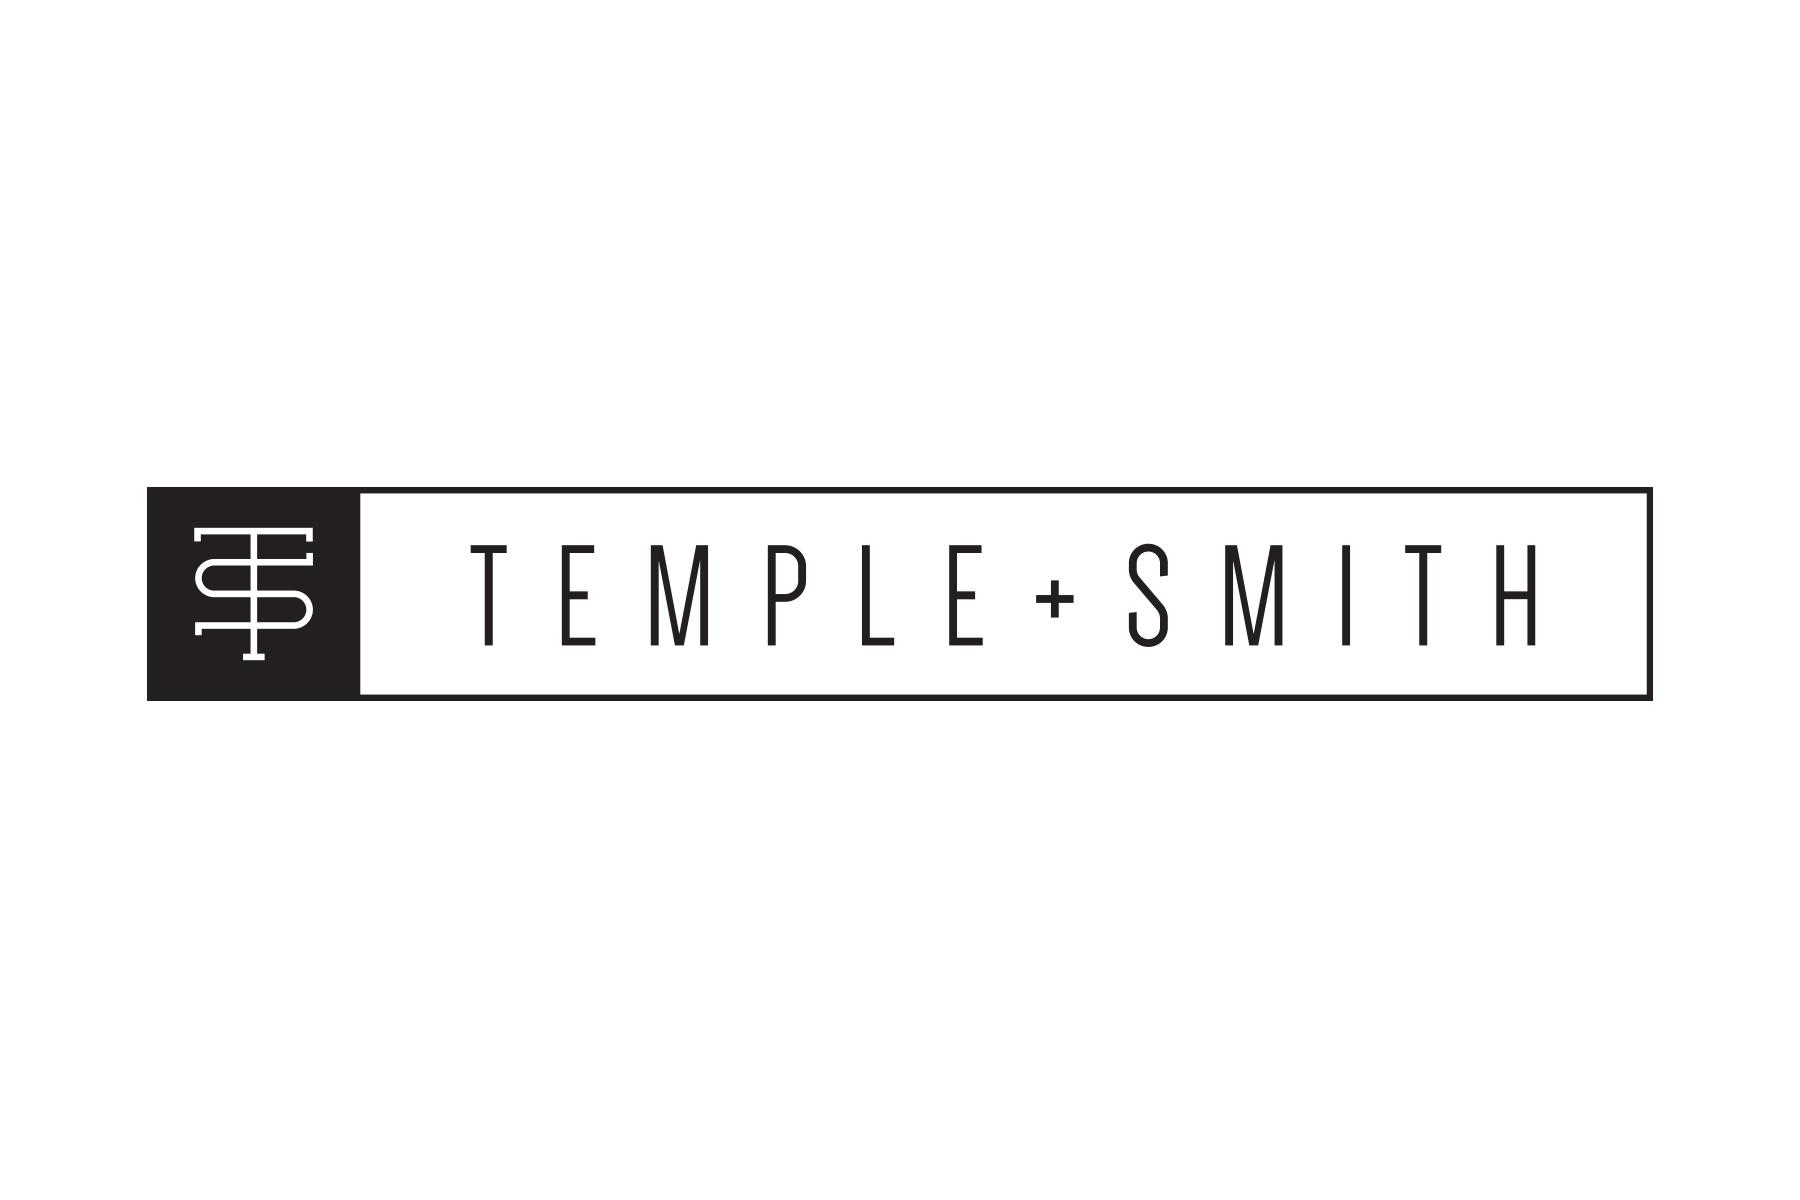 TempleSmith_6x4_ALT1_B.jpg